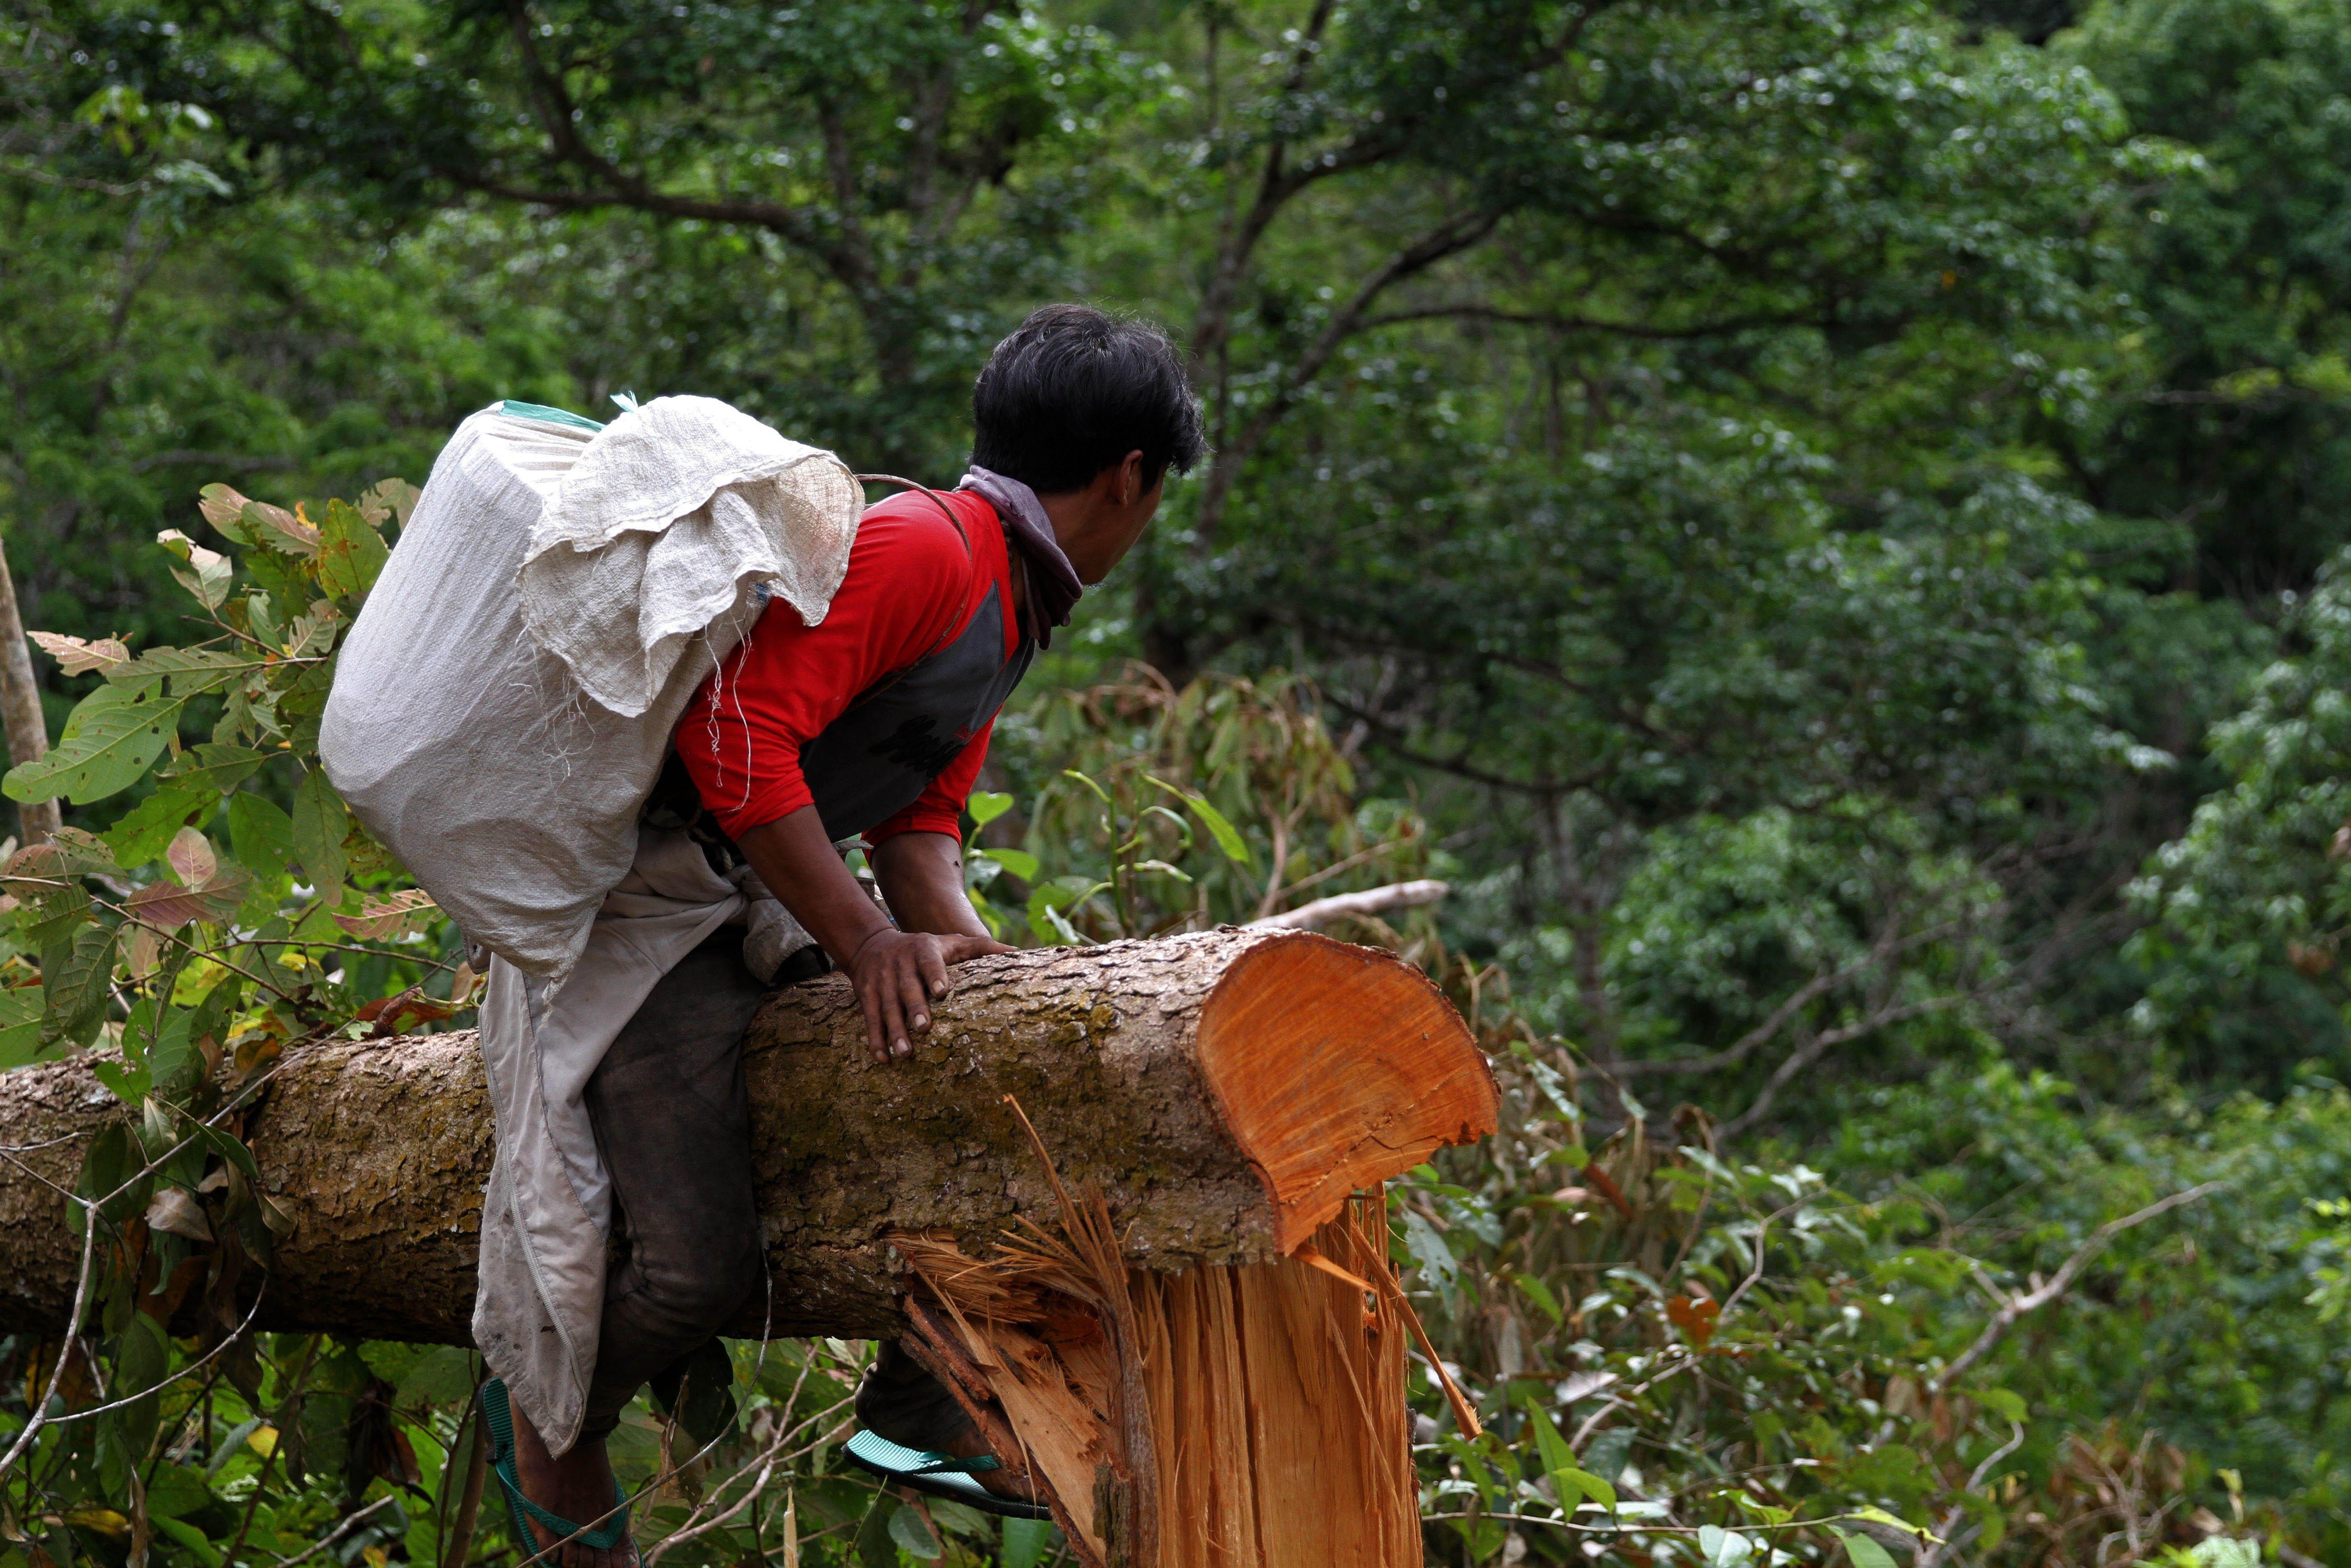 Bartono berada diatas pohon yang tumbang lengkap dengan peralatan dan mengintai lebah yang terbang agar mudah mendapatkan sarang lebahnya di Gunung Landono, di Desa Landono 2, Kecamatan Landono, Konawe Selatan, Sulawesi Tenggara.